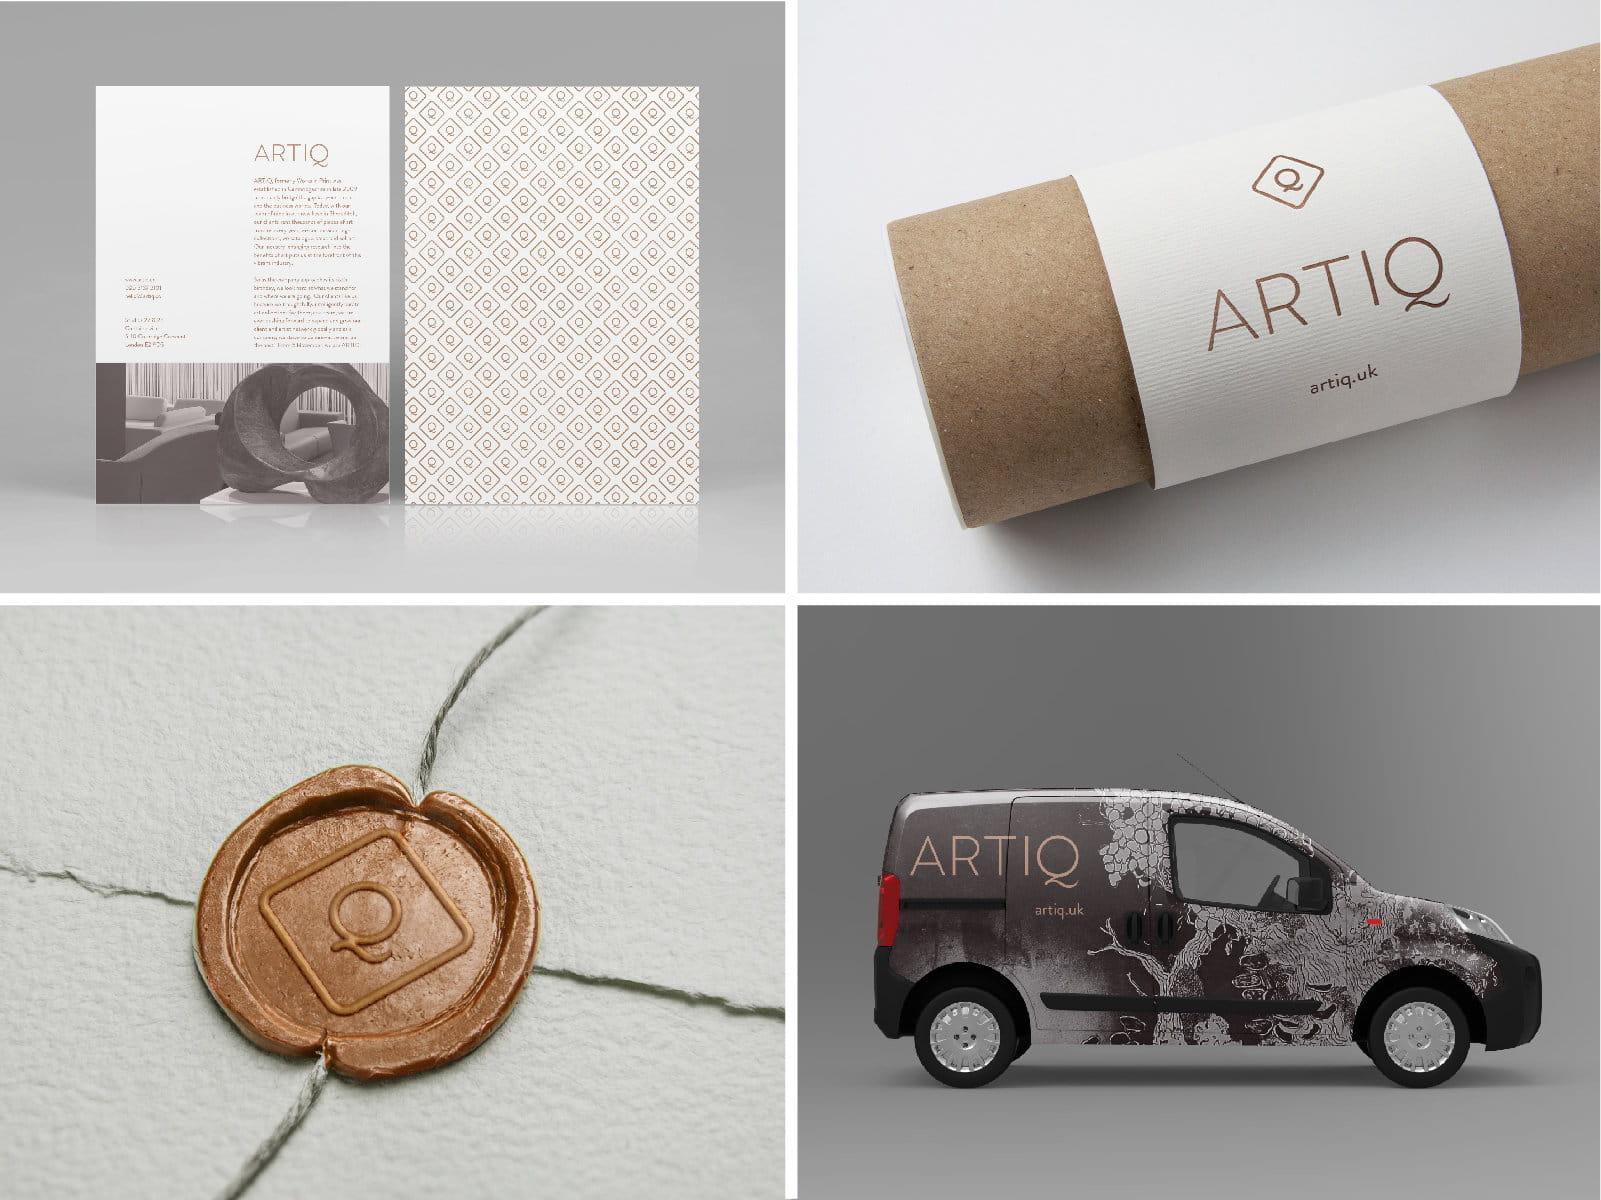 ARTIQ-branding